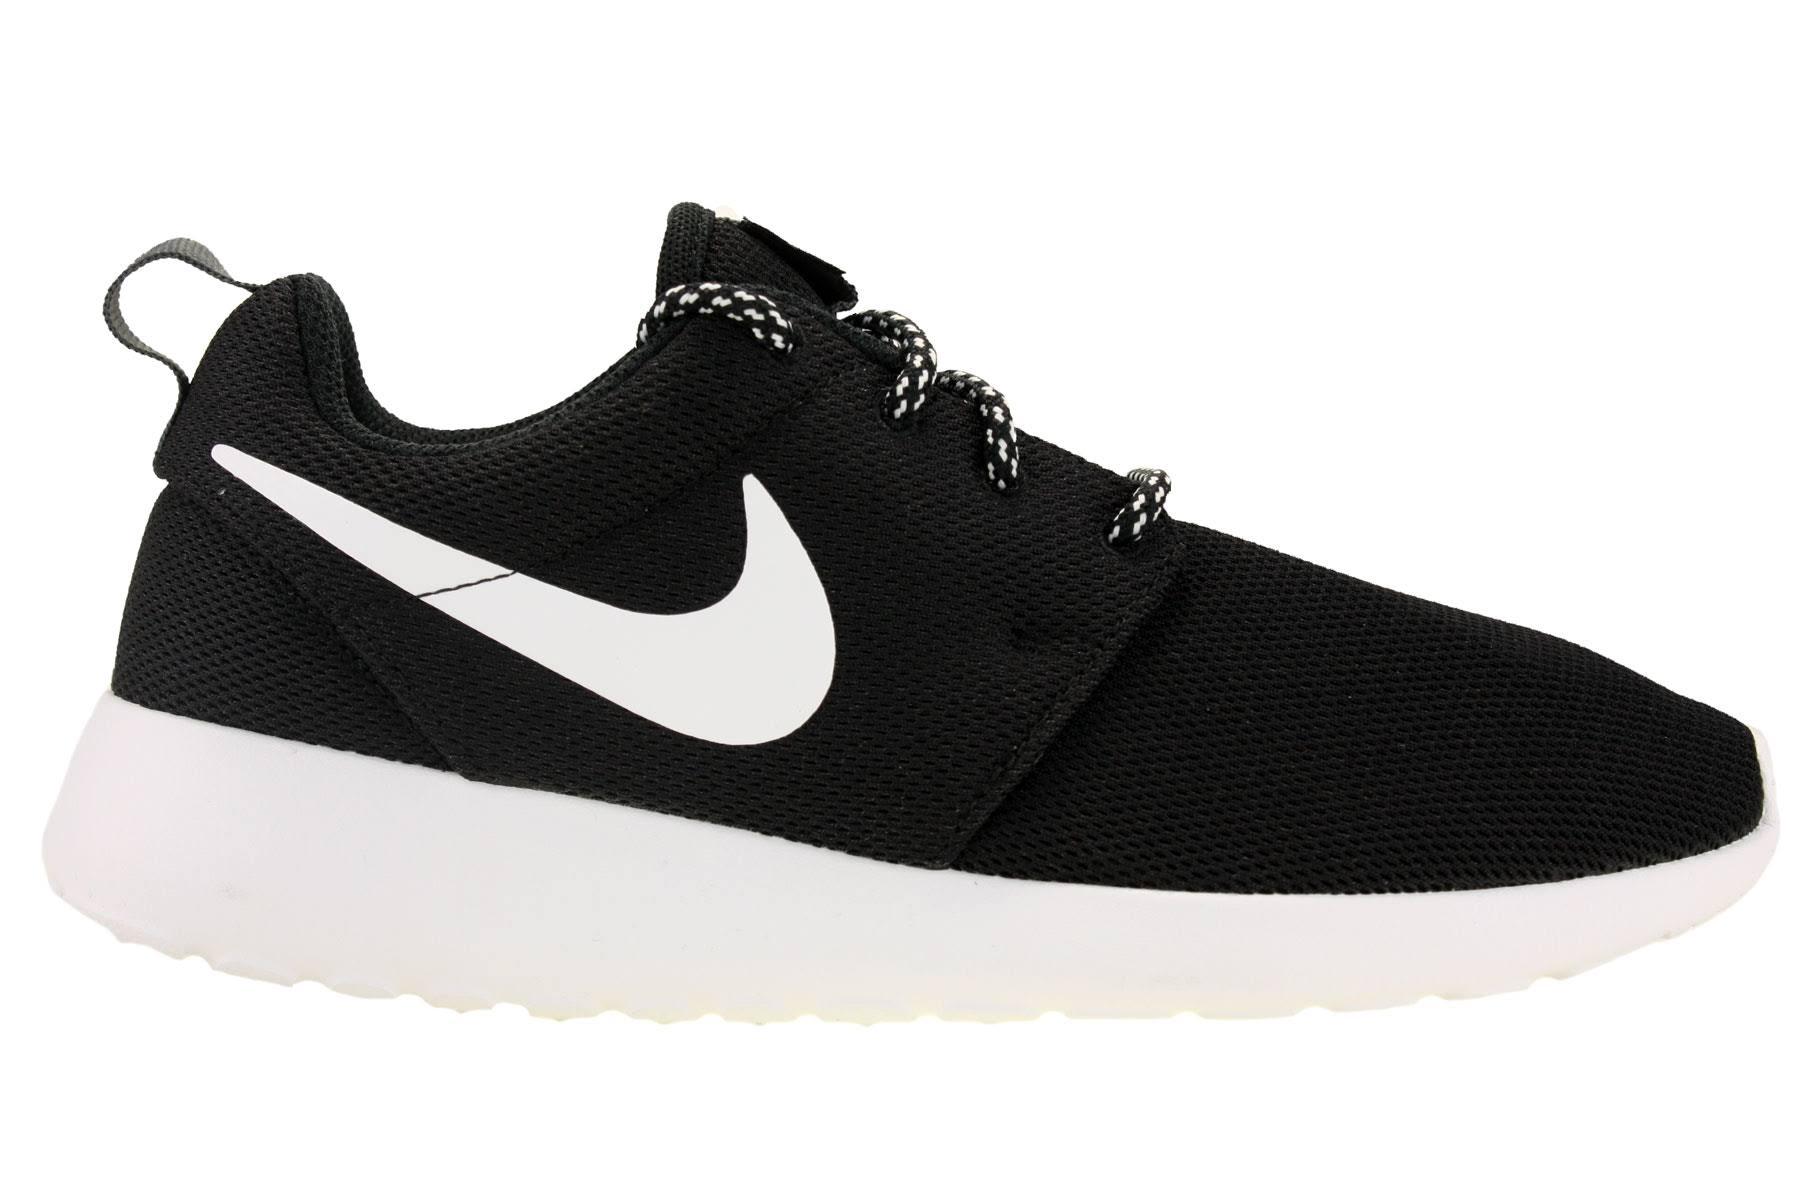 One Damesschoenenmaat9 Nike Nike One Roshe Roshe 5zwart wPkZXiTOu